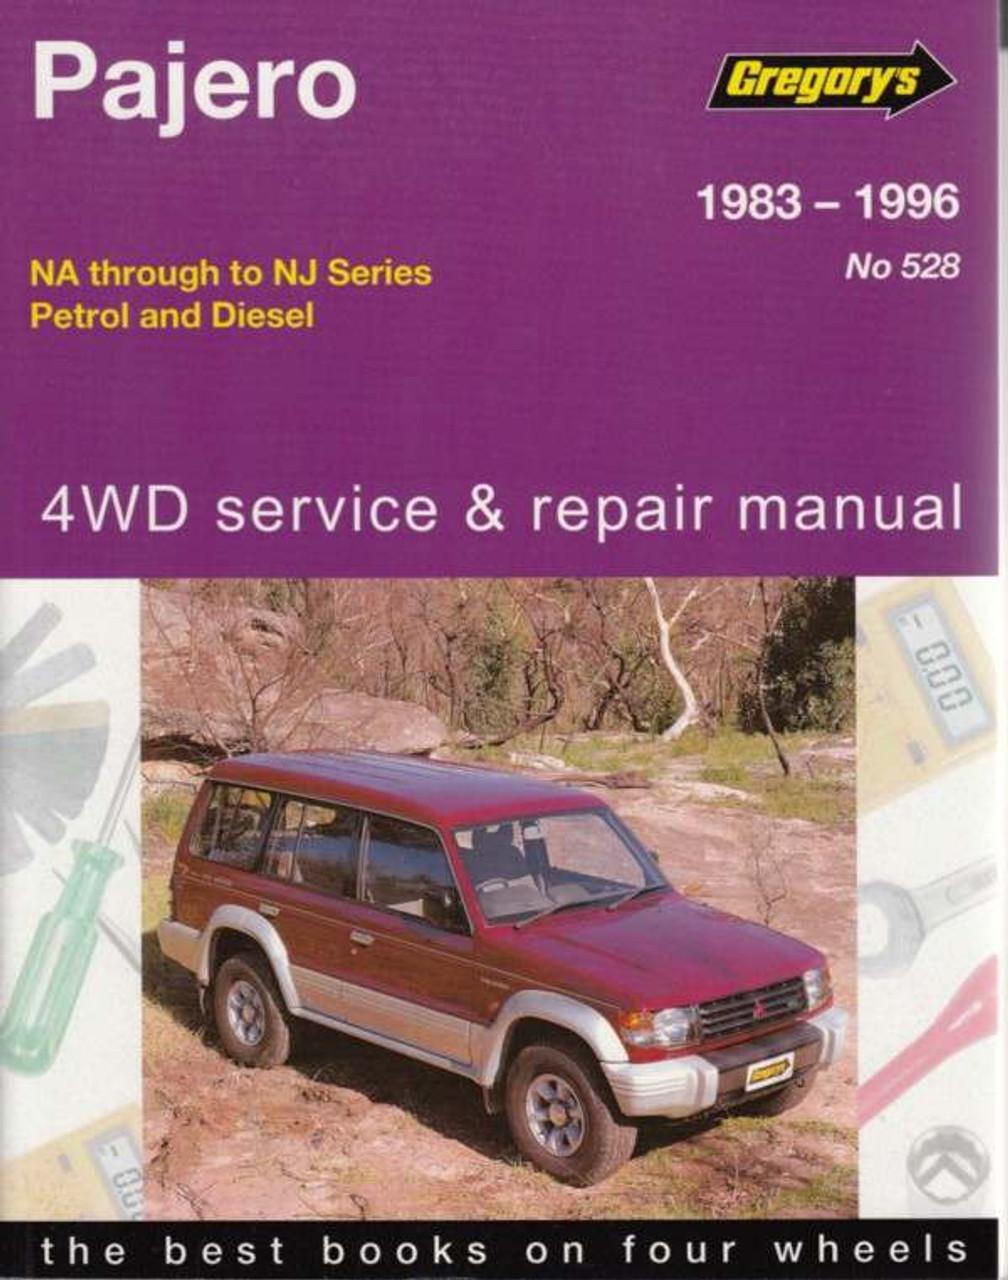 mitsubishi pajero nh through to nj petrol diesel 1983 1996 rh automotobookshop com au Mitsubishi Outlander Mitsubishi Pajero 2015